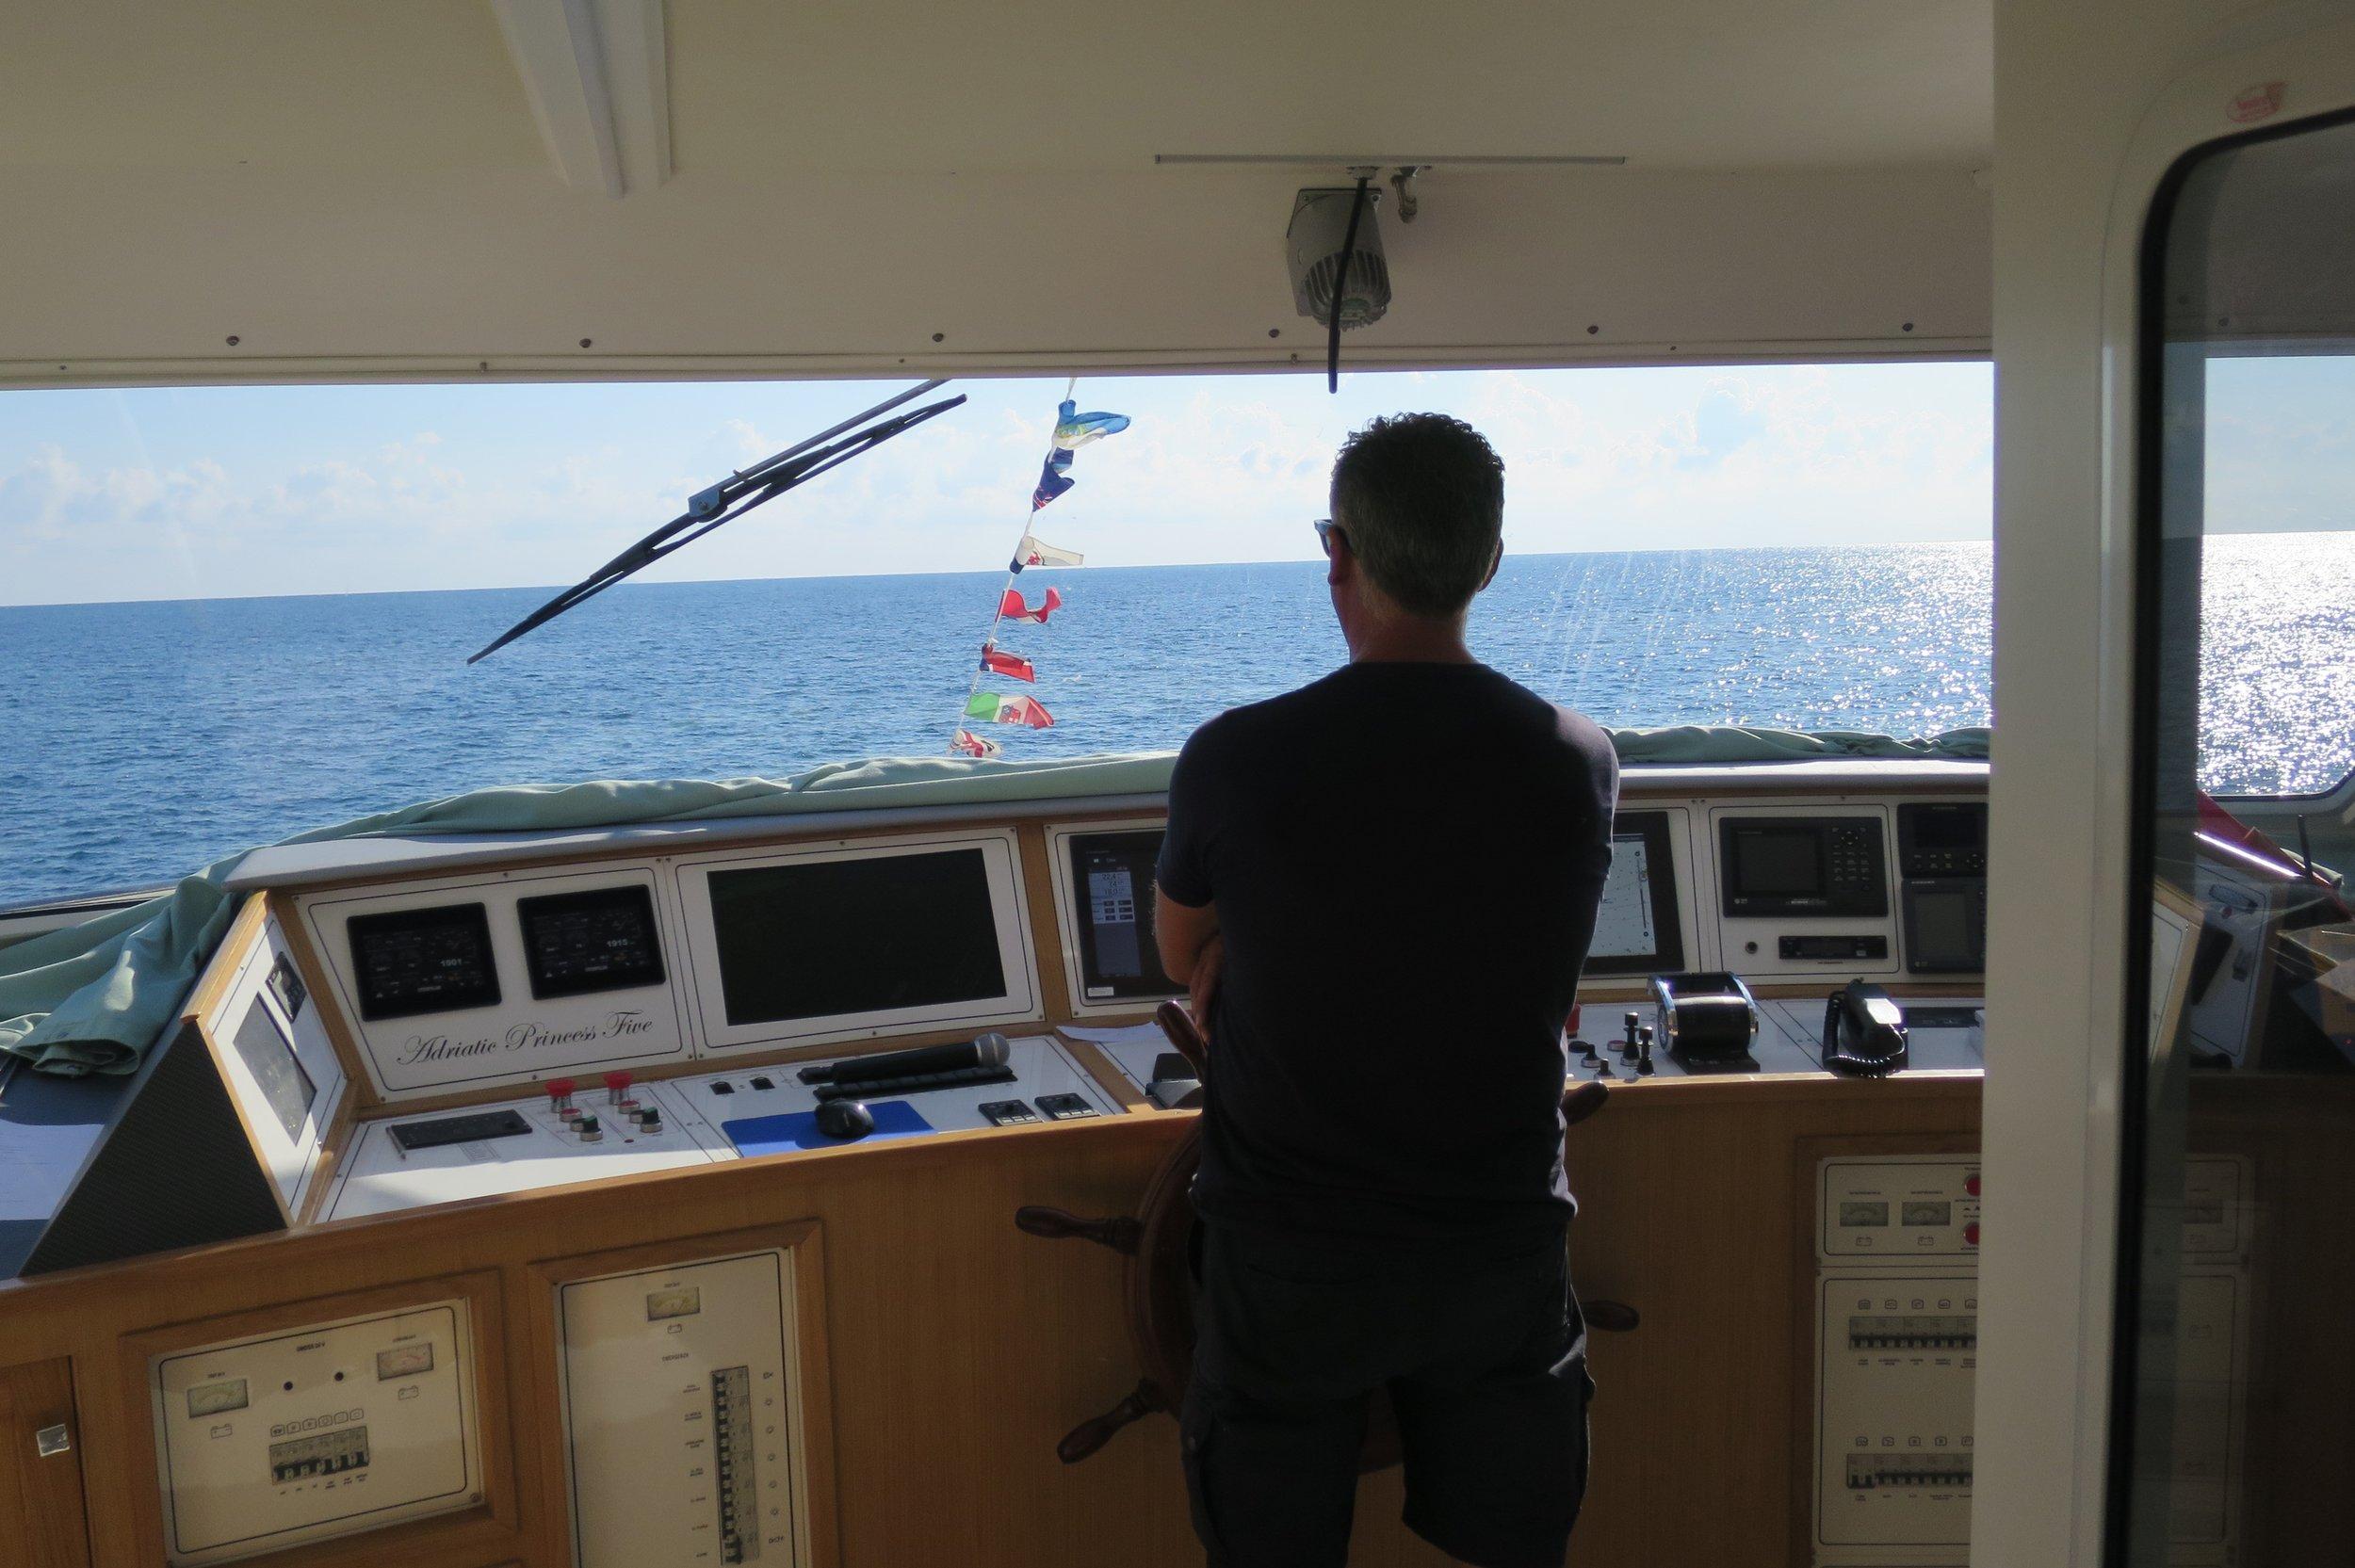 marine-control-ship-navigation-equipment-transportation-captain-technology-interior-panel_t20_eo2ZWa.jpg